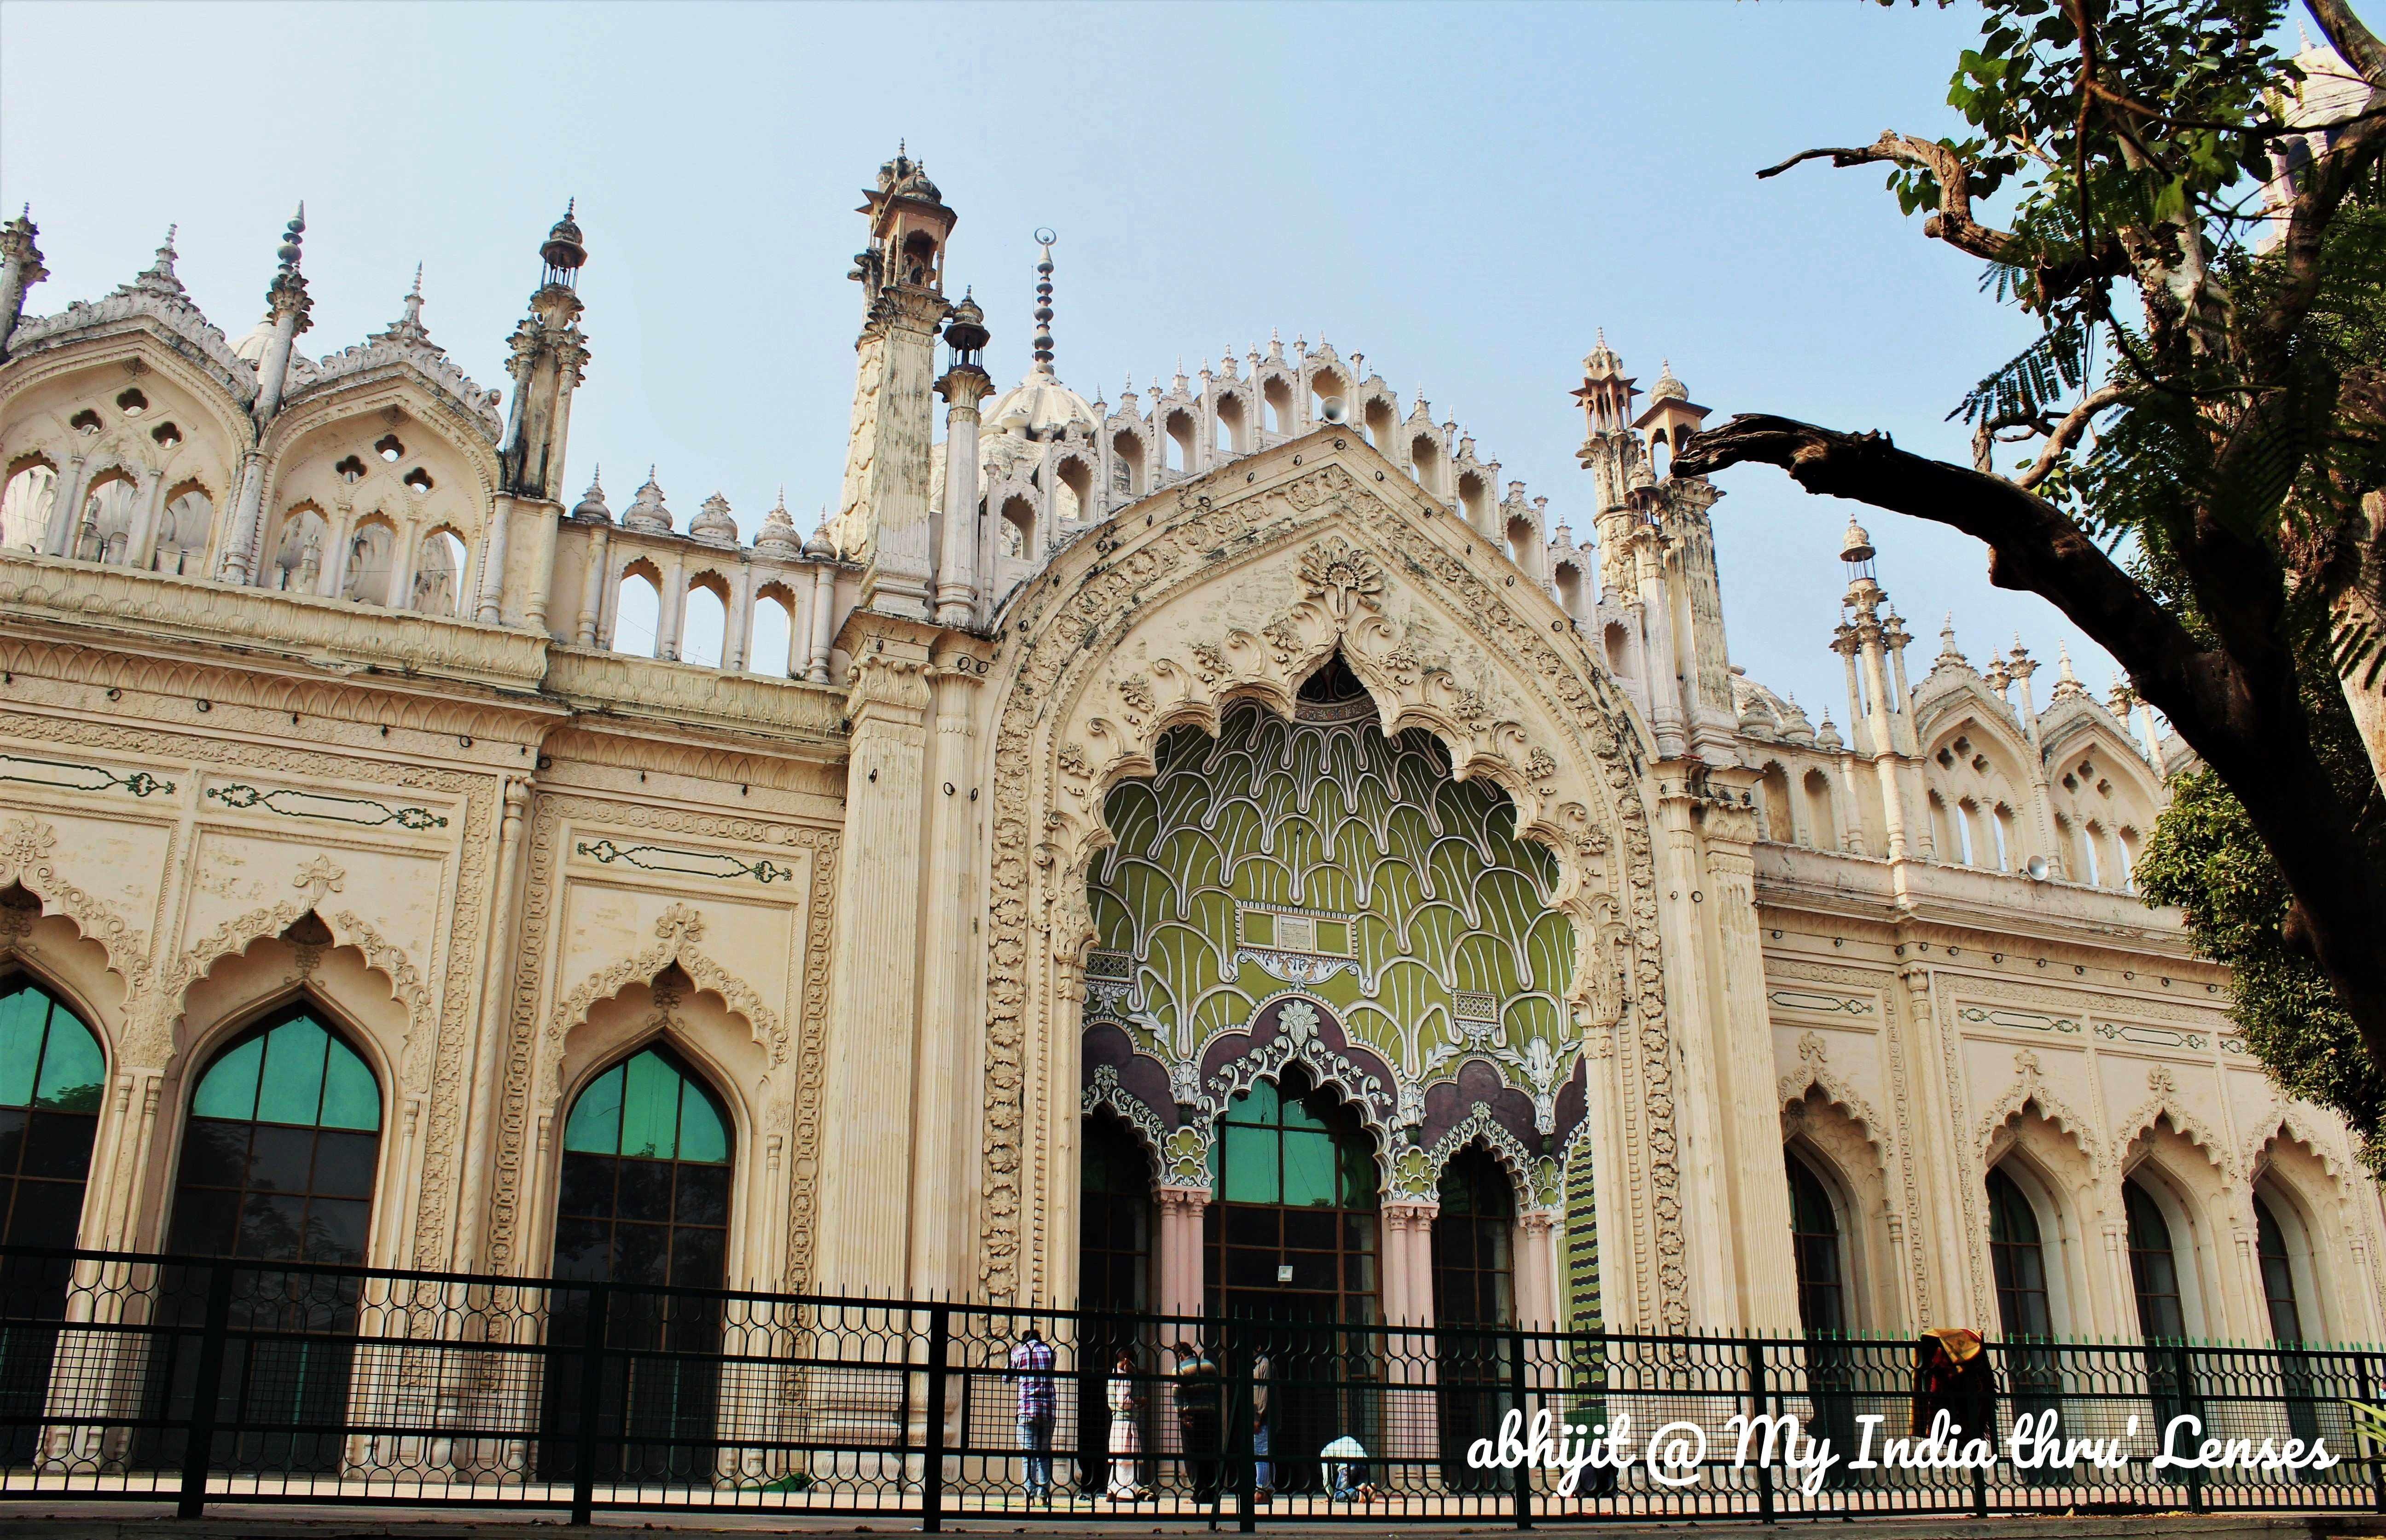 The Jama Masjid, Lucknow